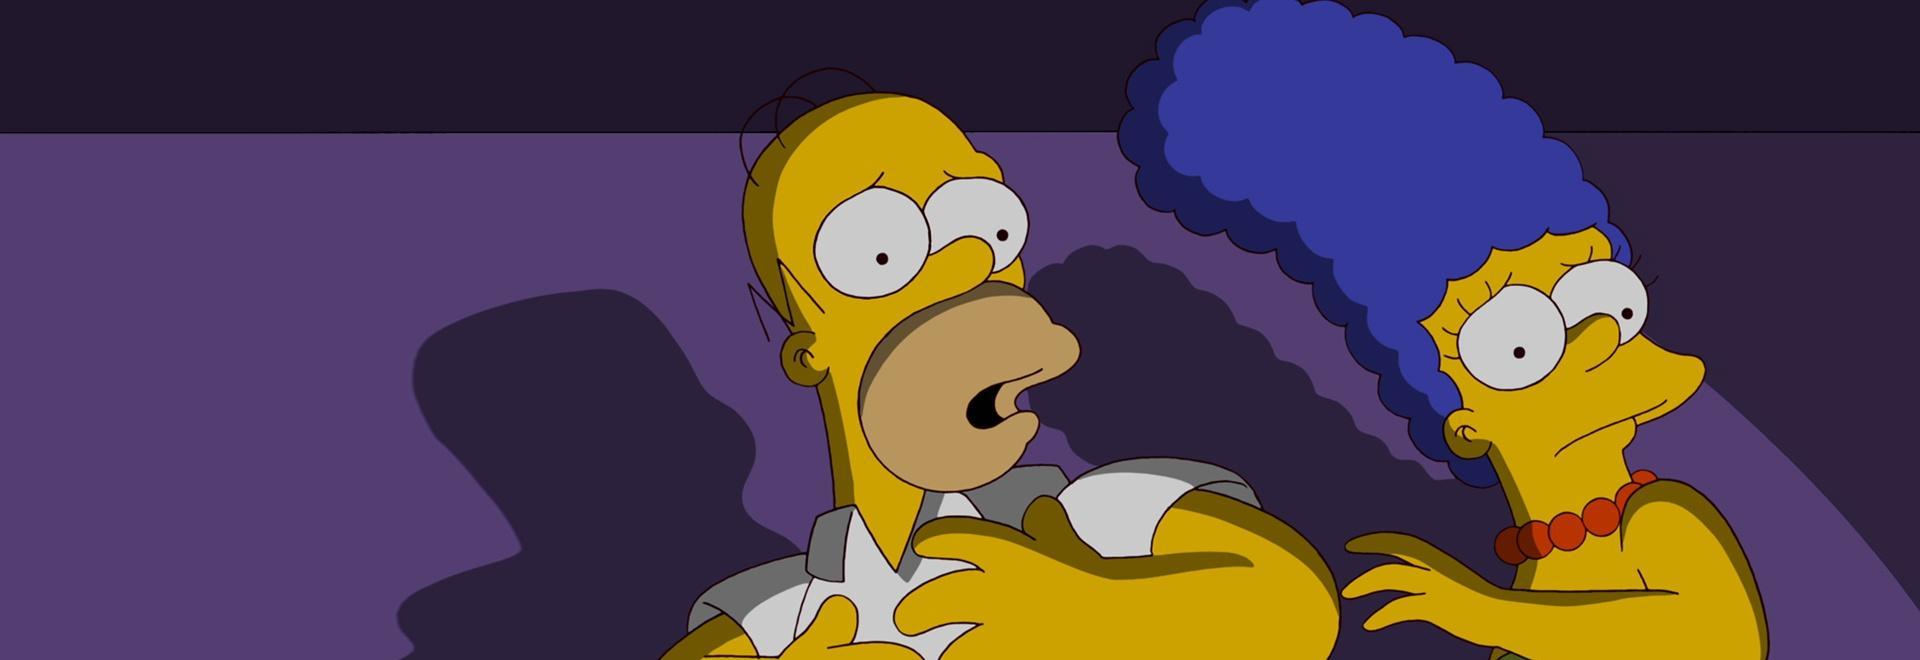 Bart si ferma ad annusare Roosevelt